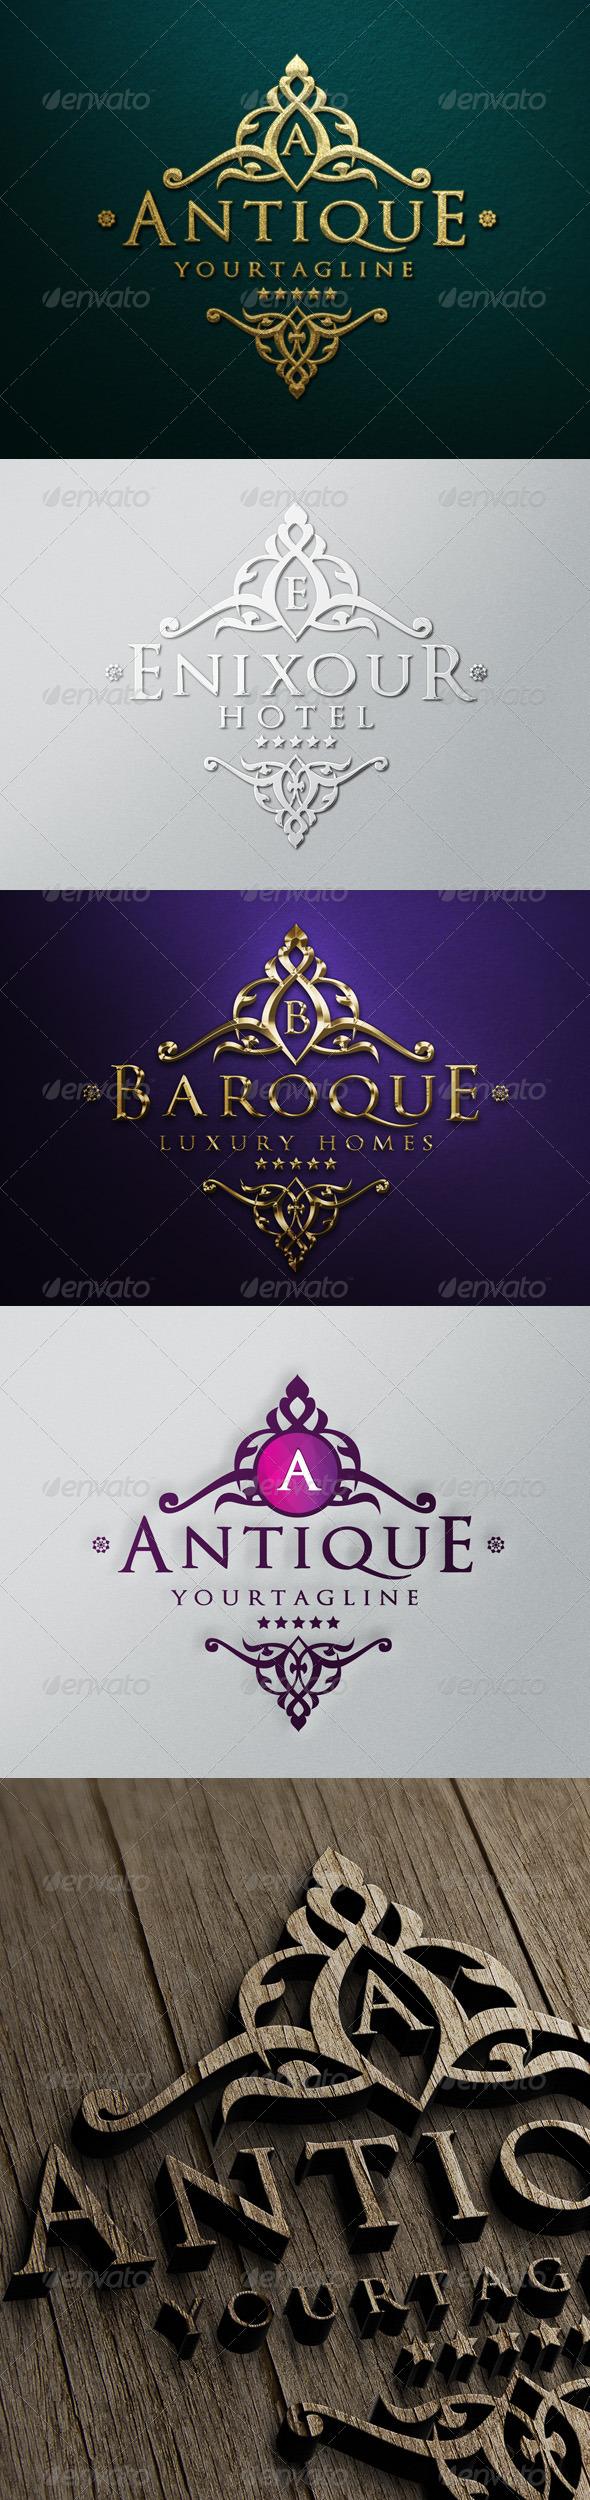 crest-logos3